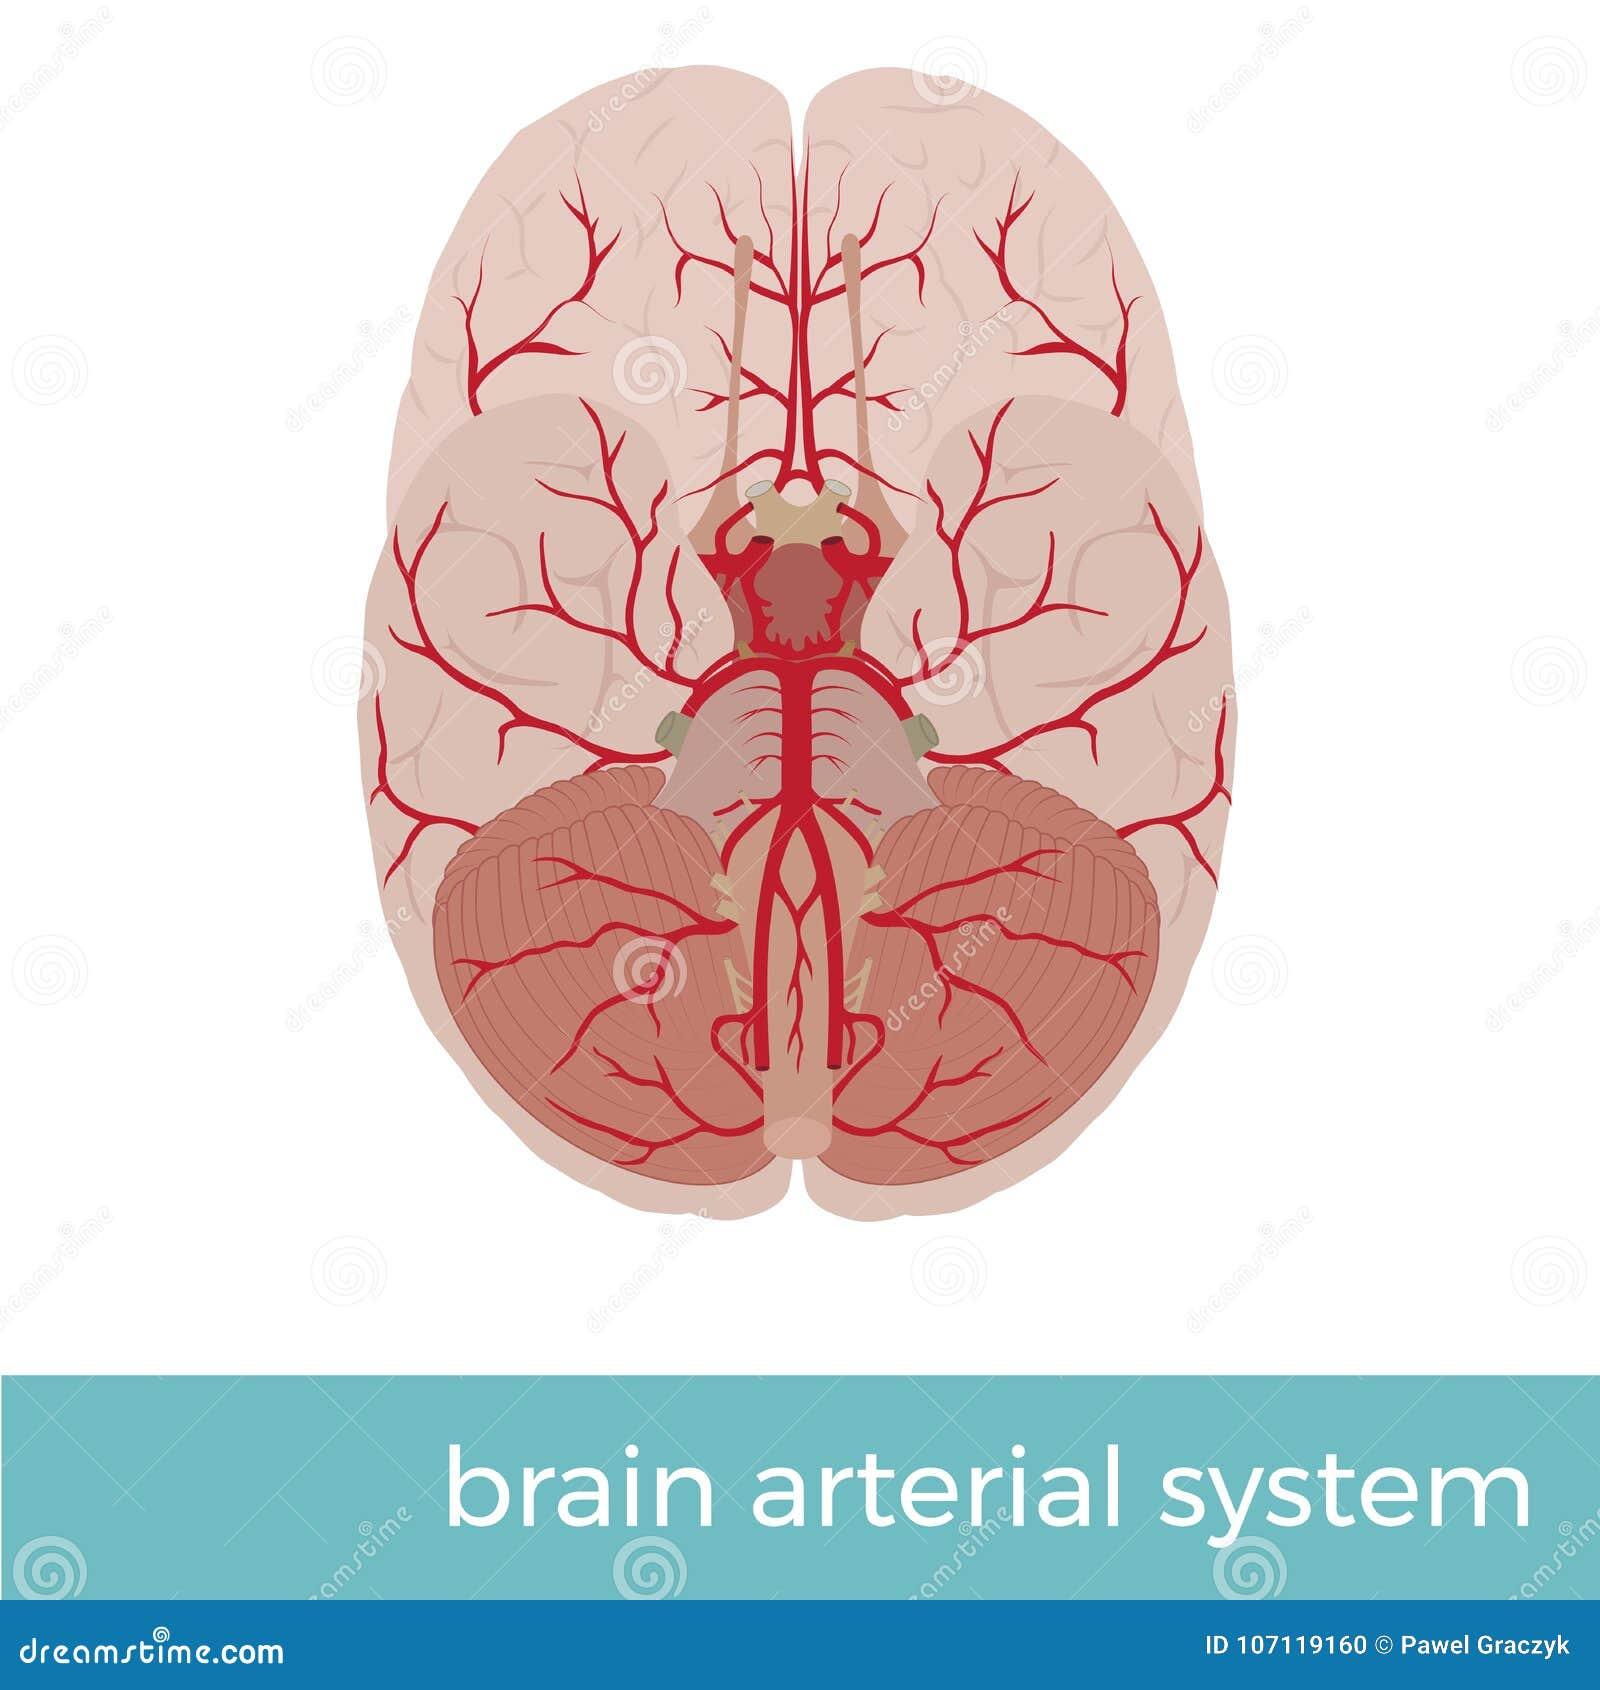 Human Brain Arterial System Stock Vector Illustration Of White